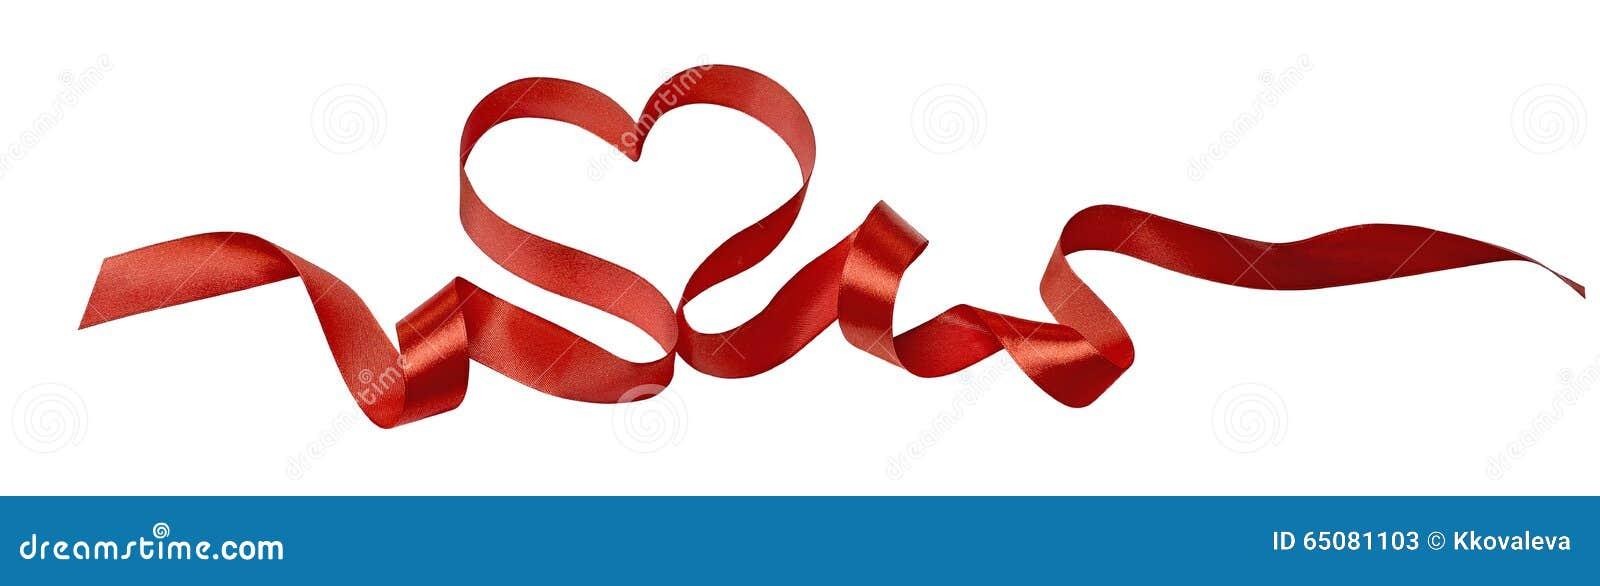 heart ribbon valentine design image horizontal isolated - Valentine Ribbon